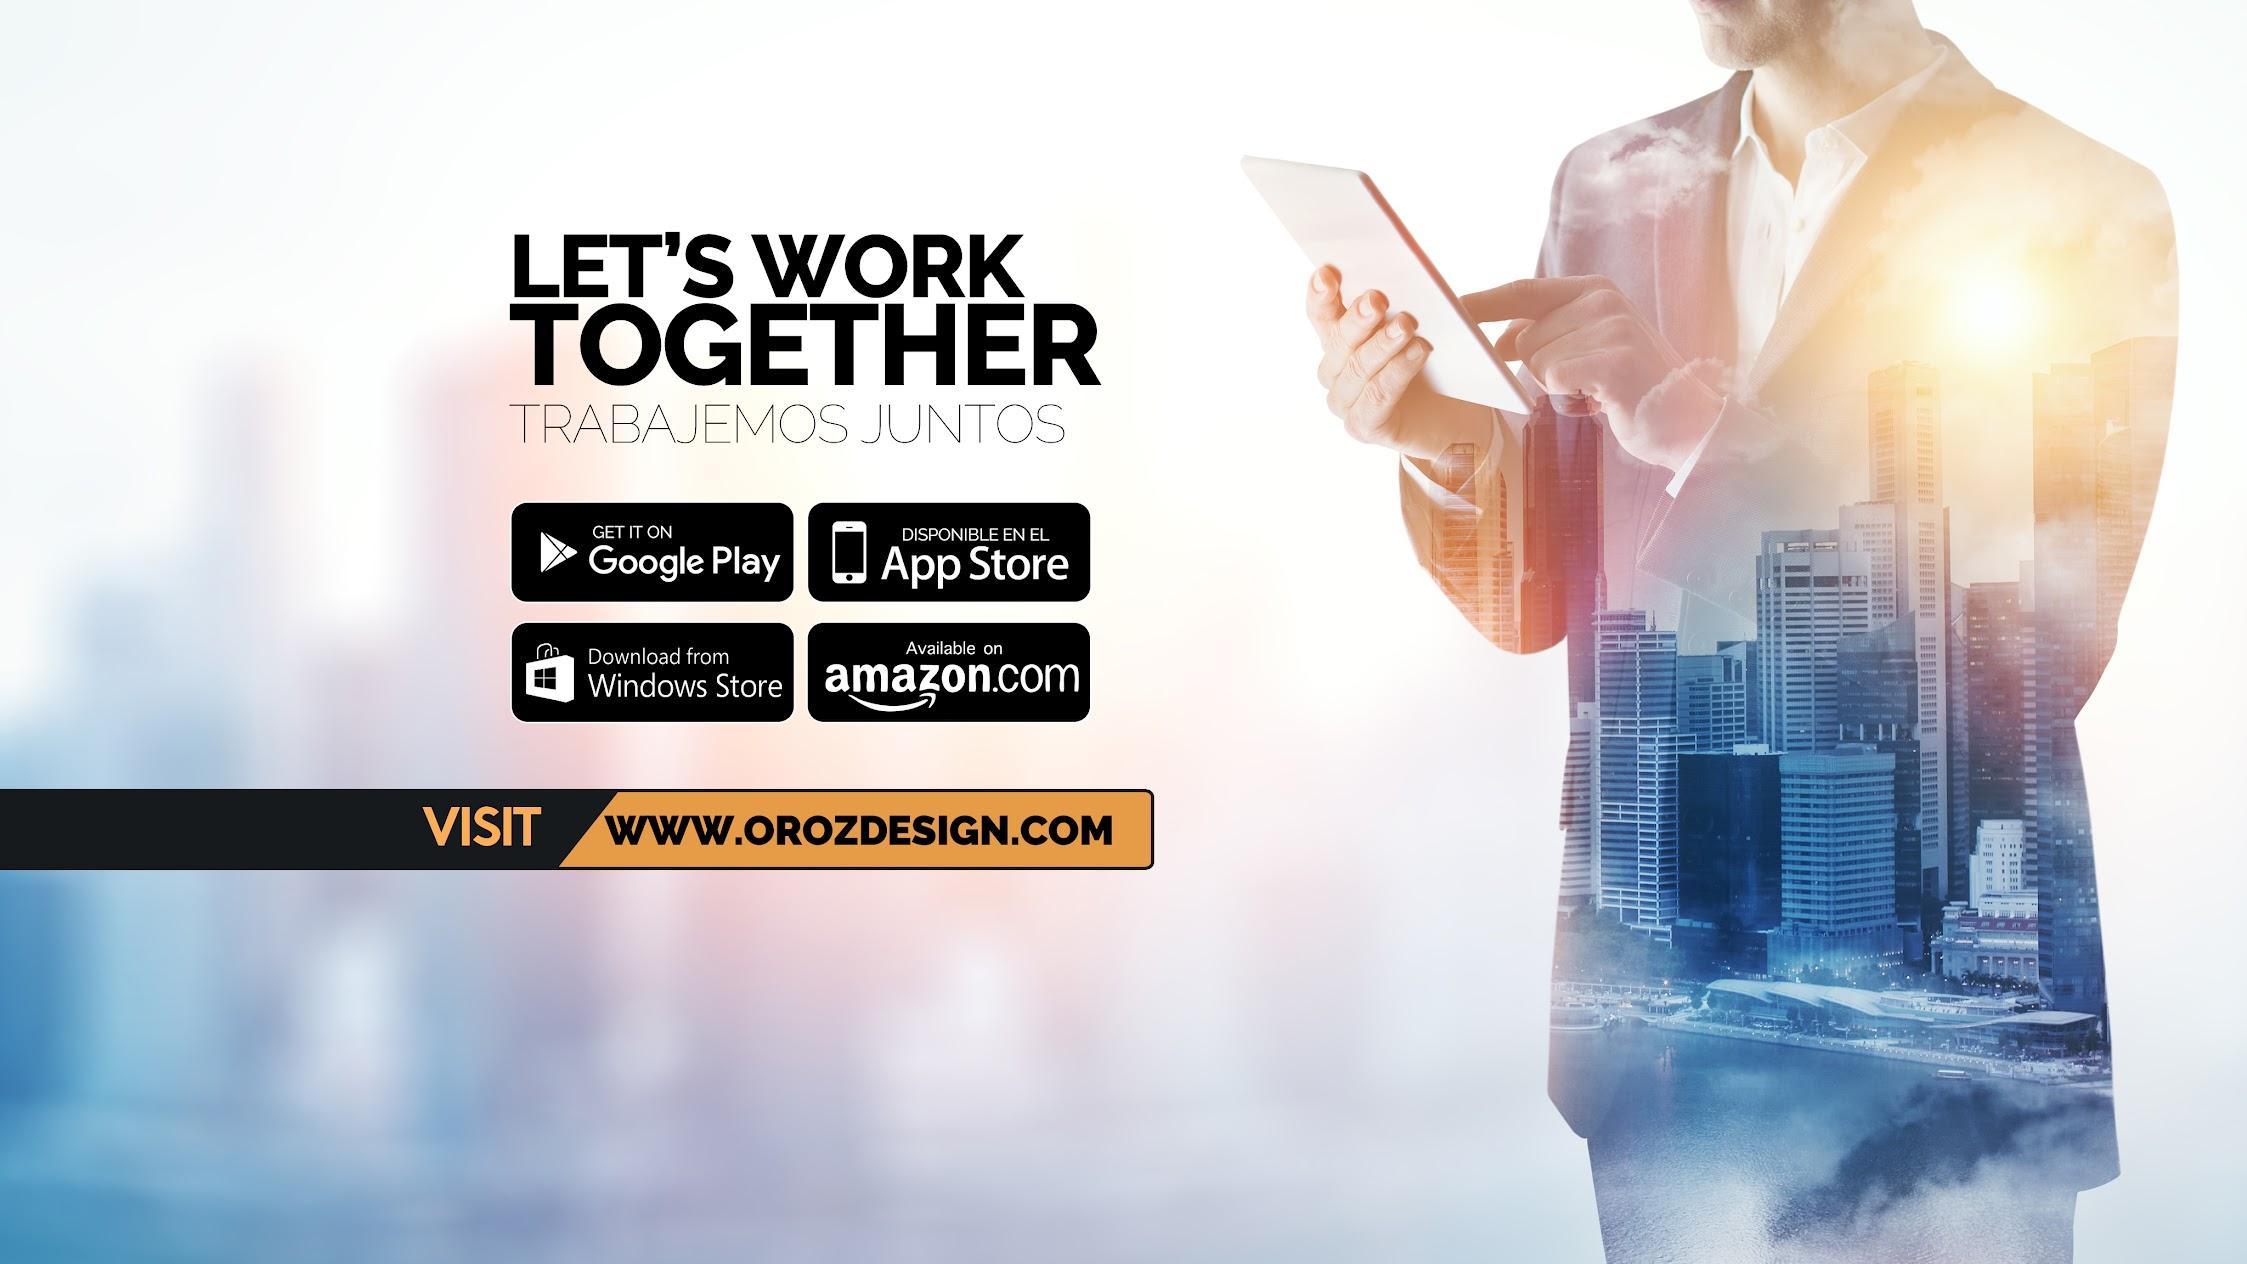 OrozDesign Multimedia Group International